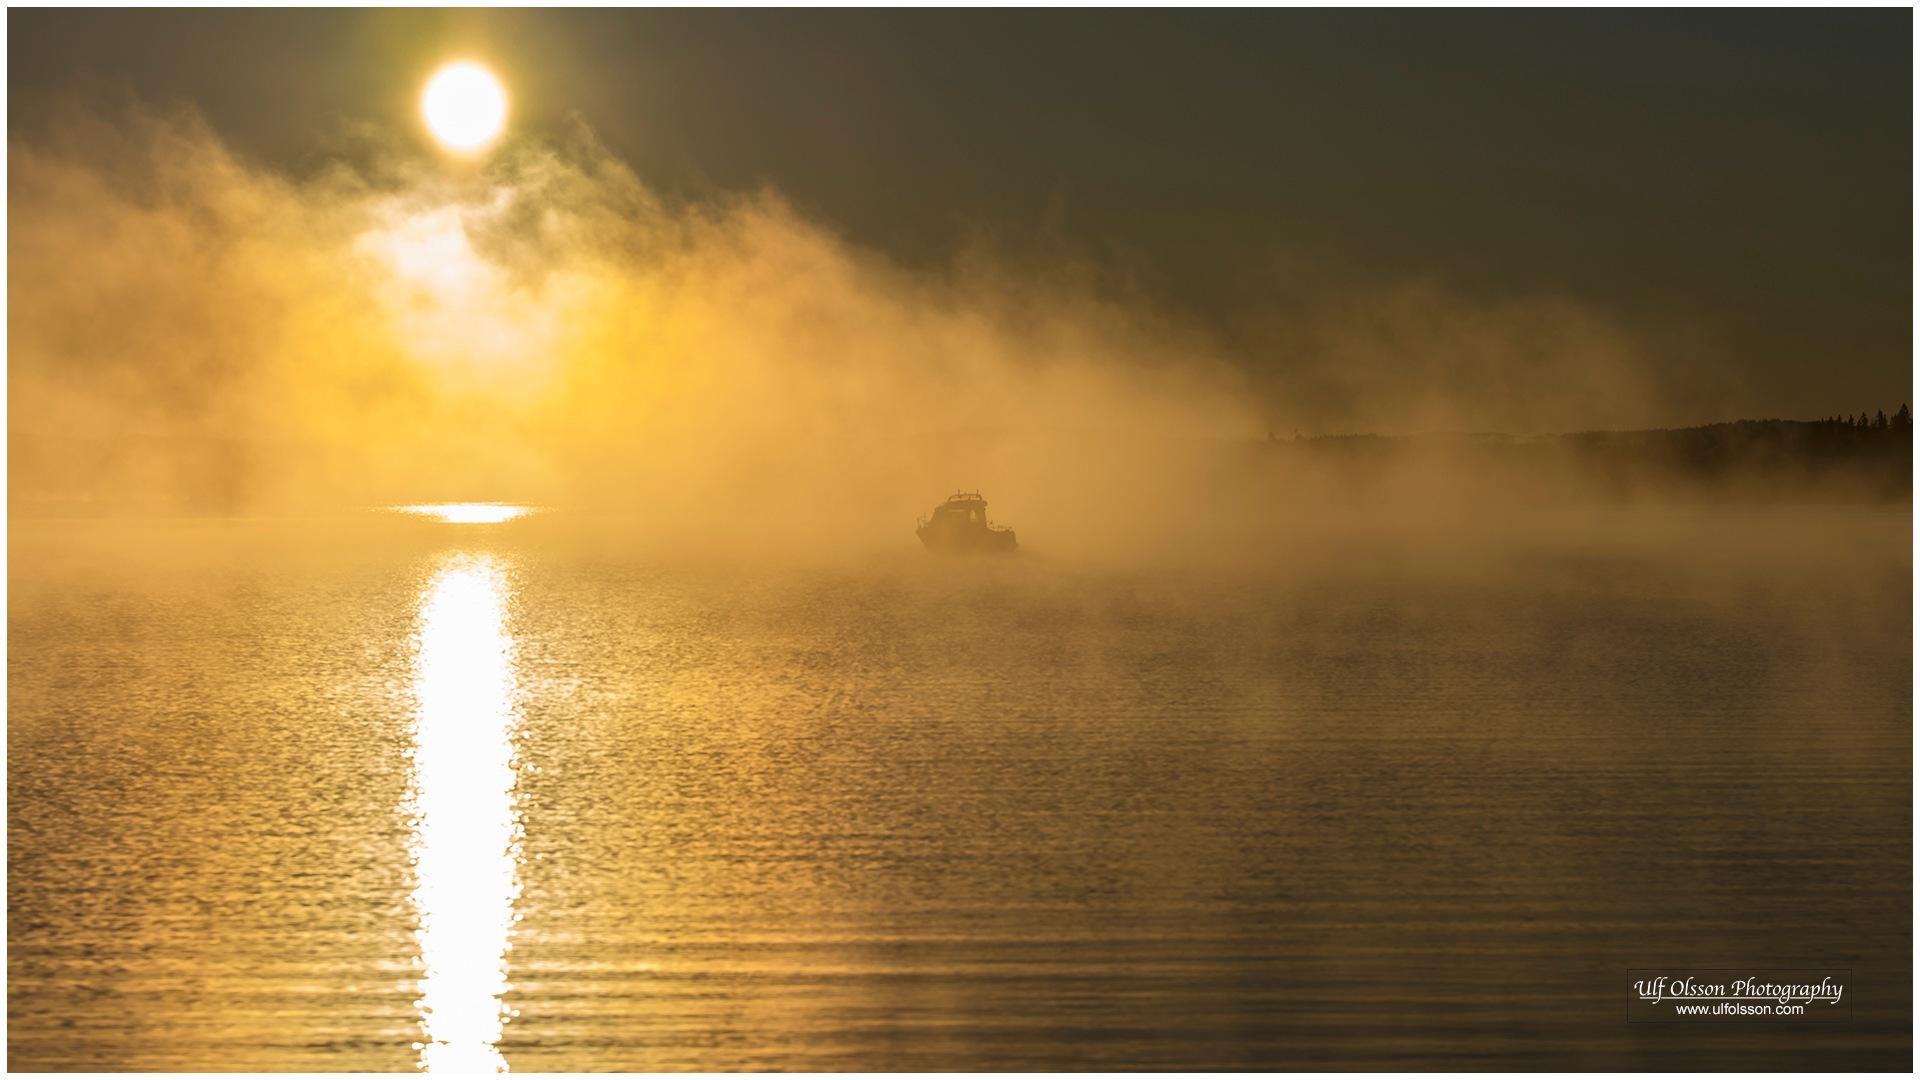 Early morning boat by uffeo56